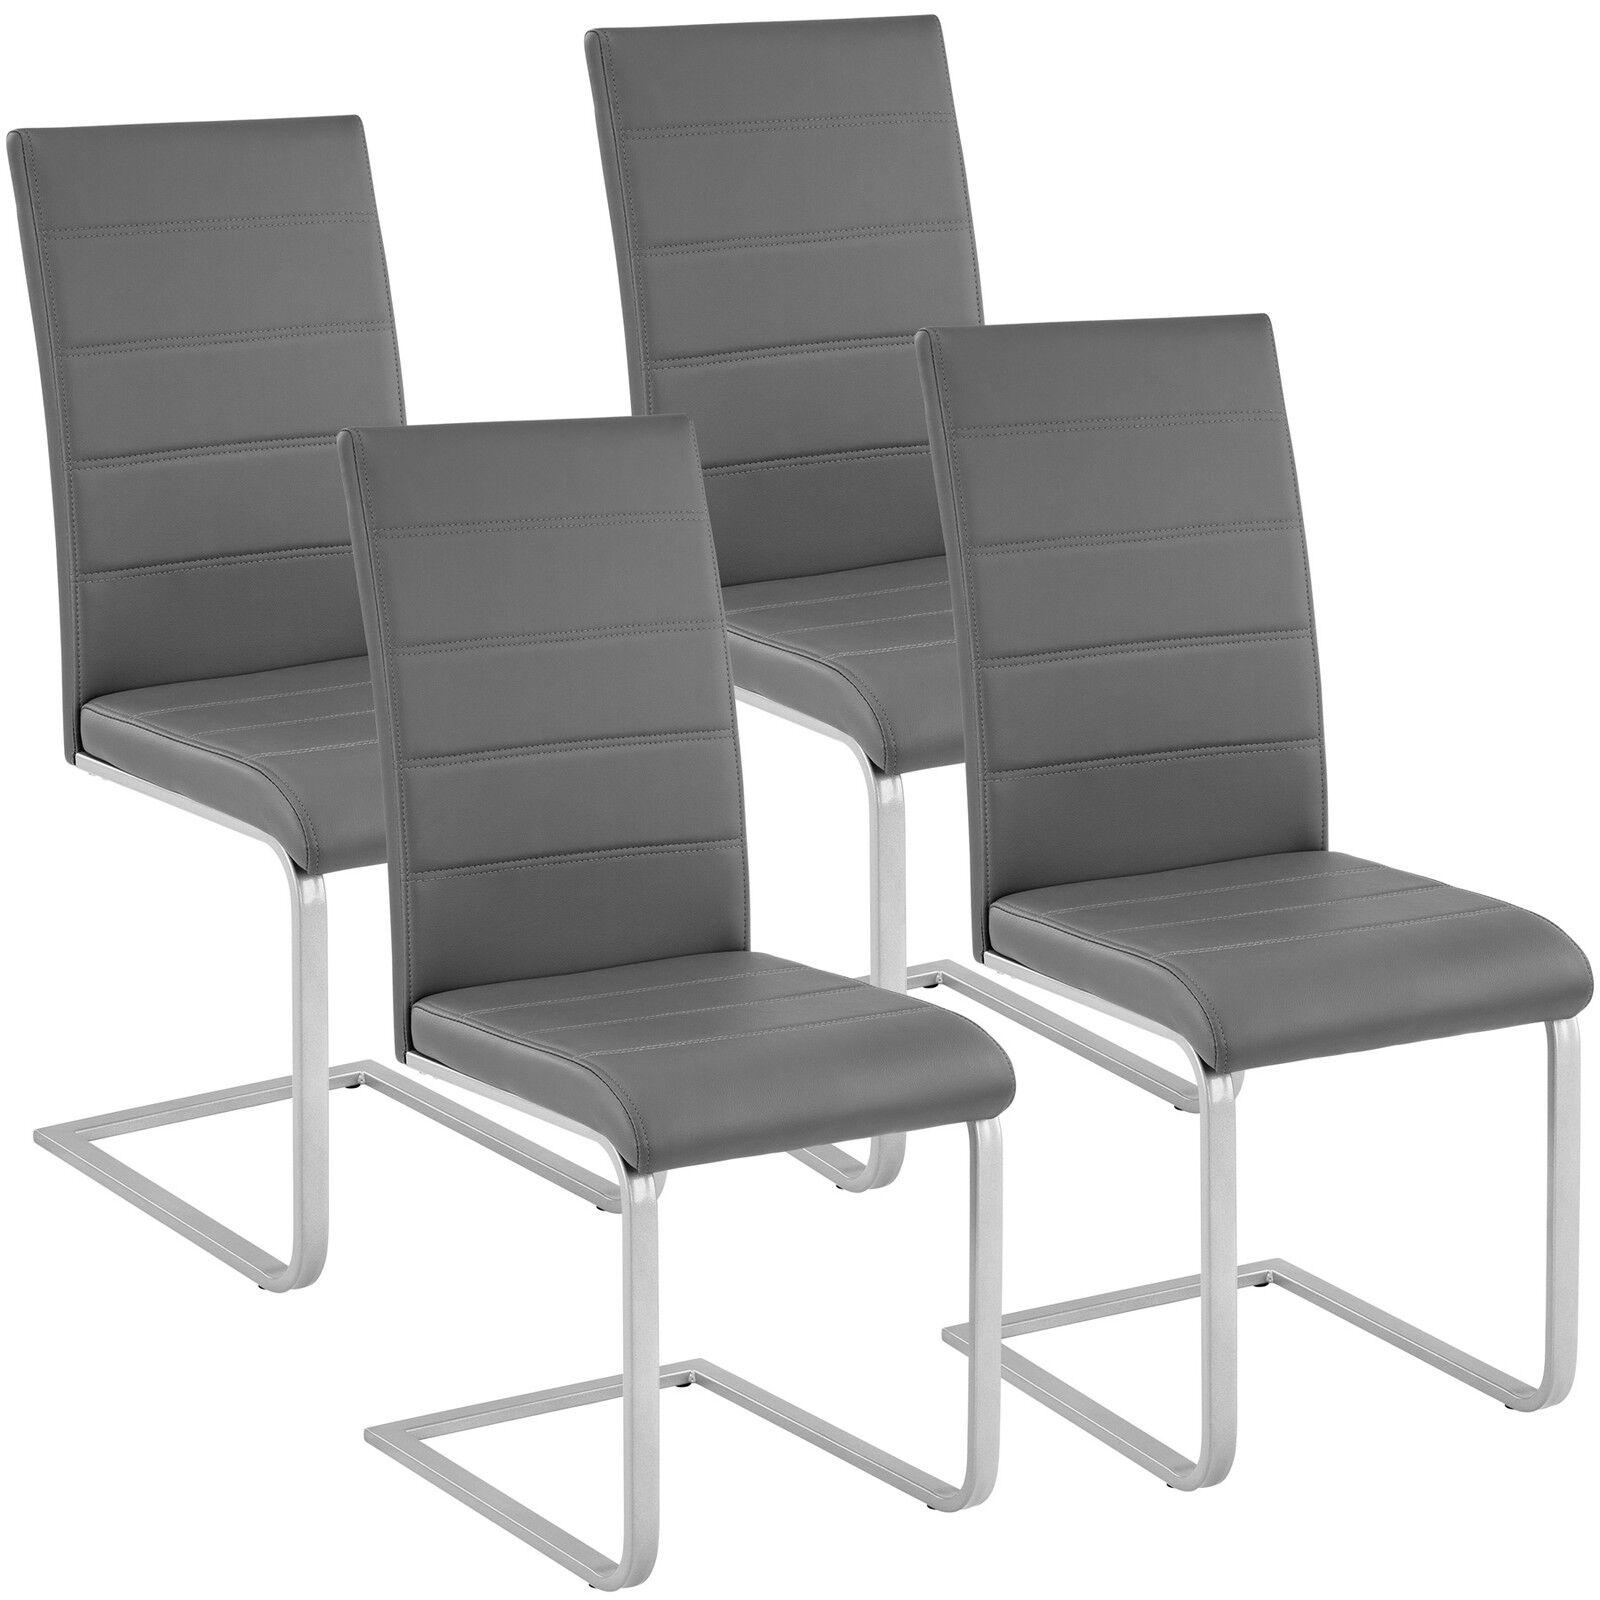 Kit de Sillas Cantilever de Comedor Juego Elegantes unidades Diseño Moderno 4 unidades Elegantes 1f2114